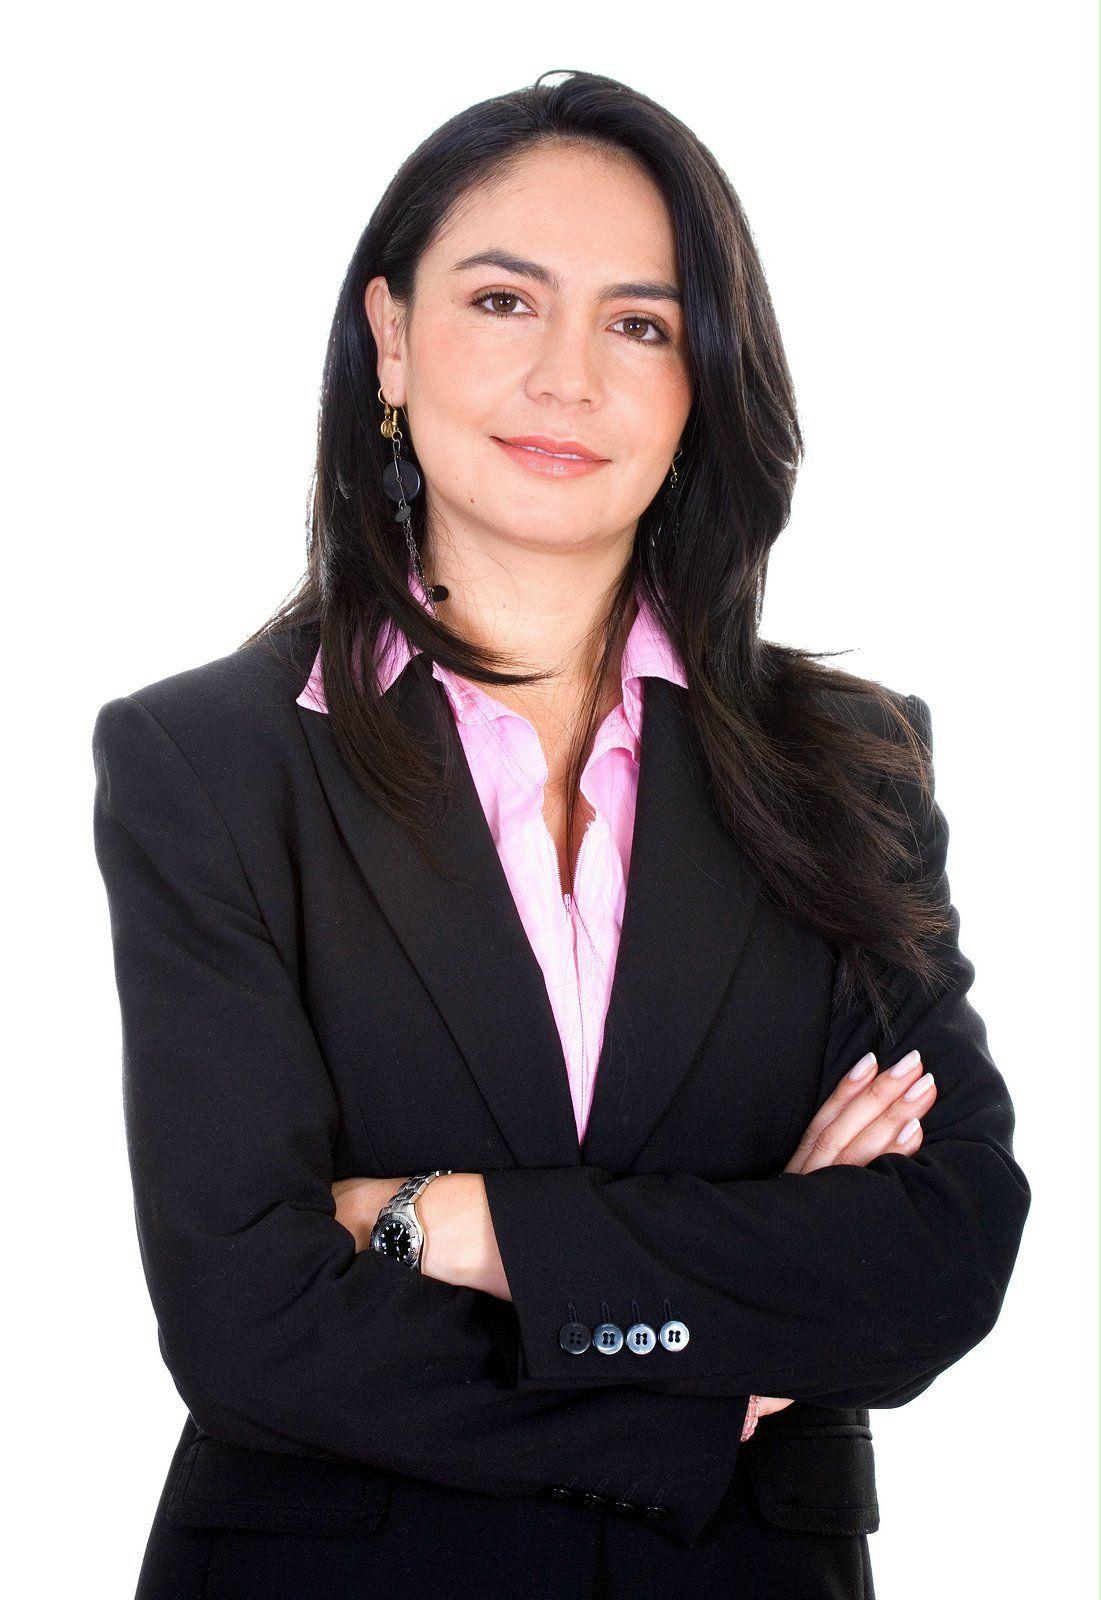 bigstock-business-woman-portrait-1722616-business-woman